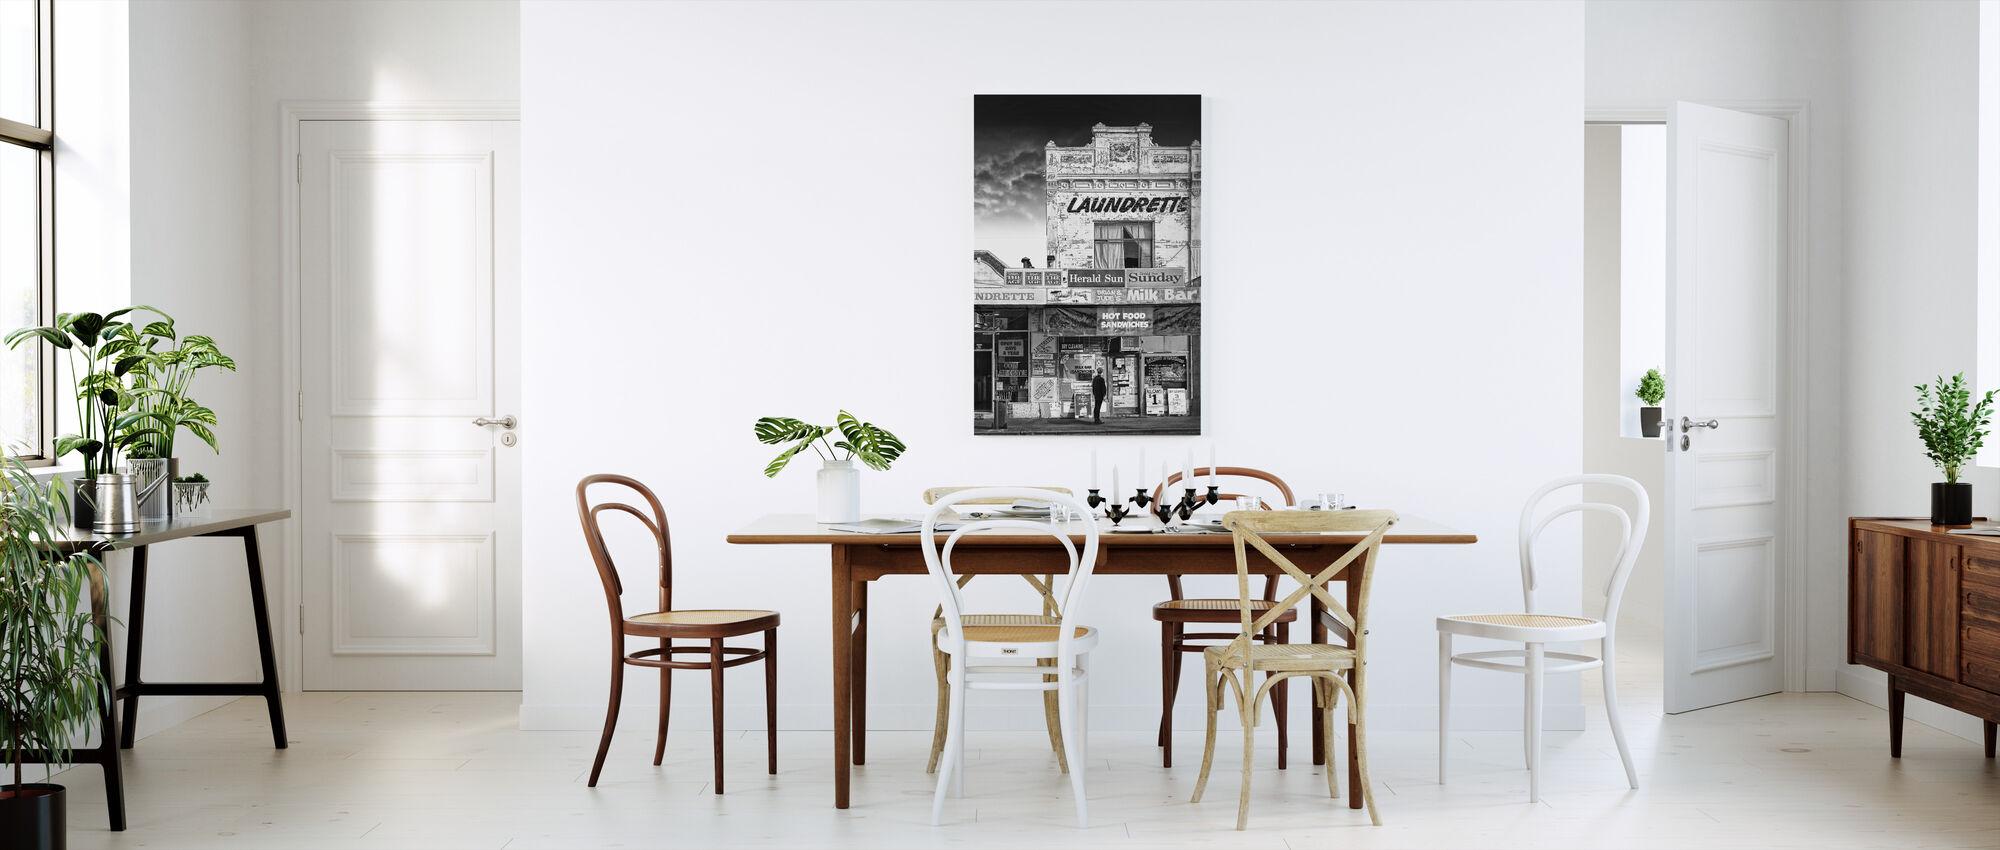 Mixed Business - Canvas print - Kitchen